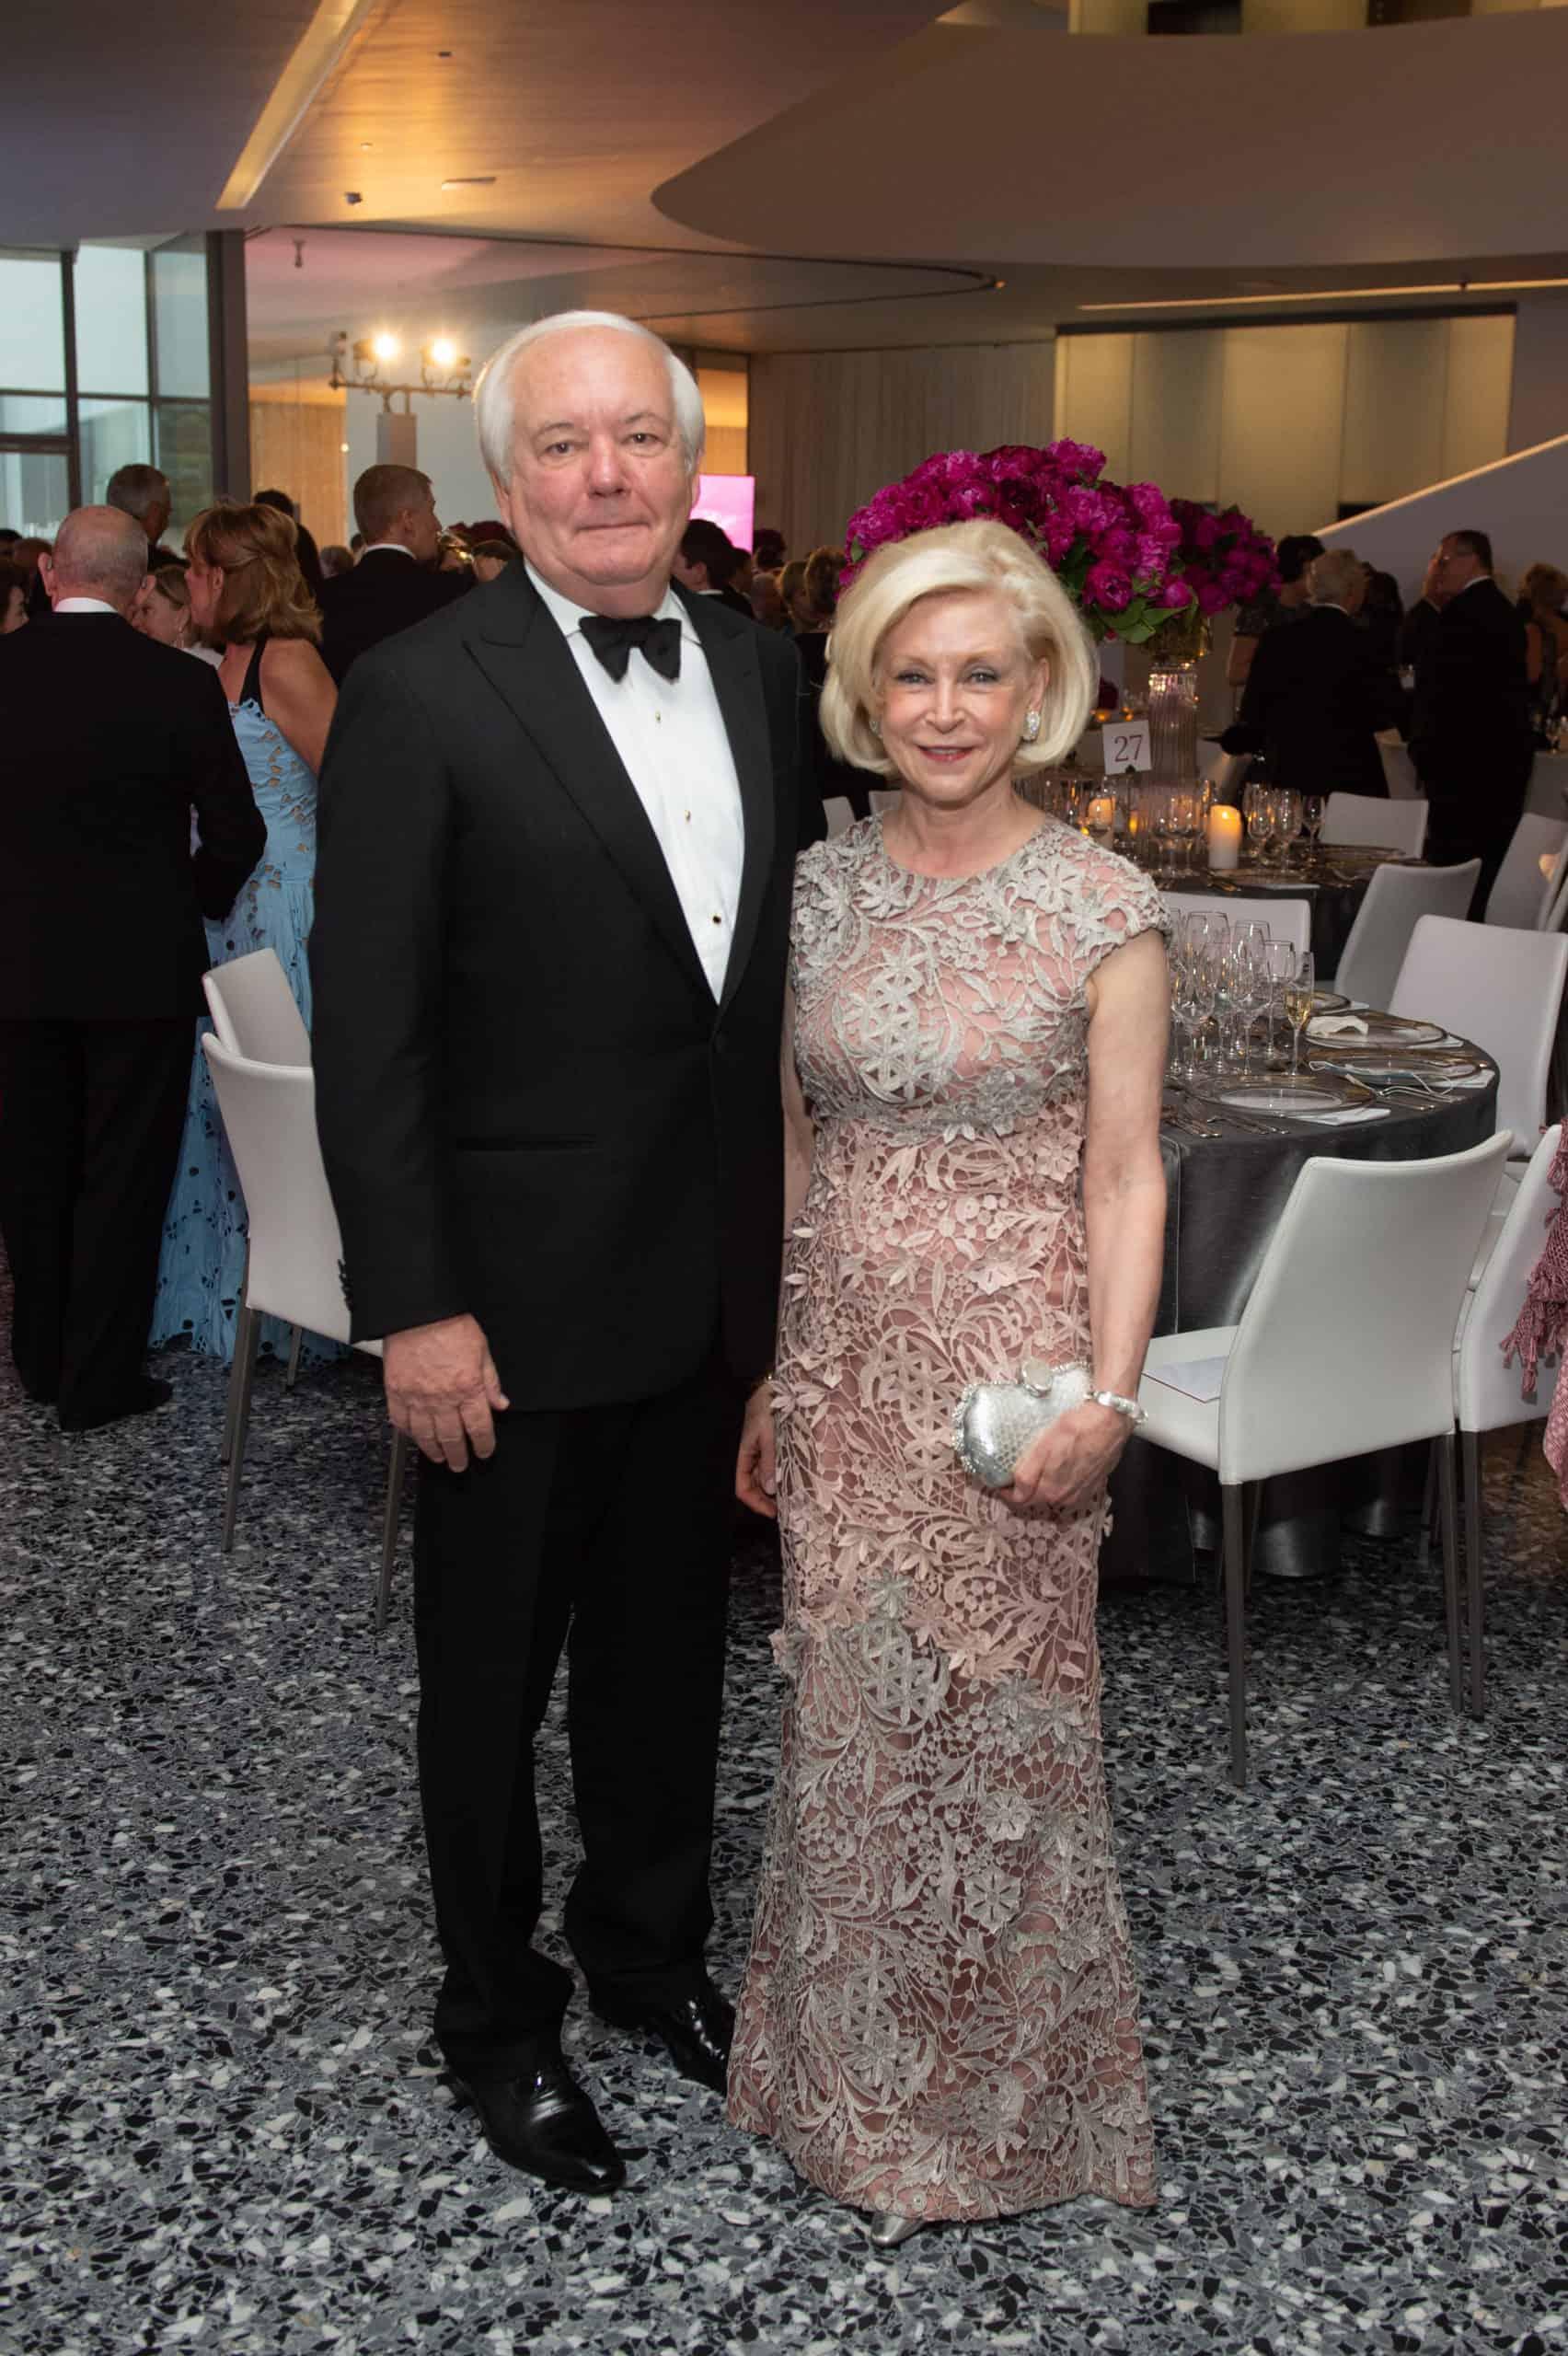 Ann and John Bookout